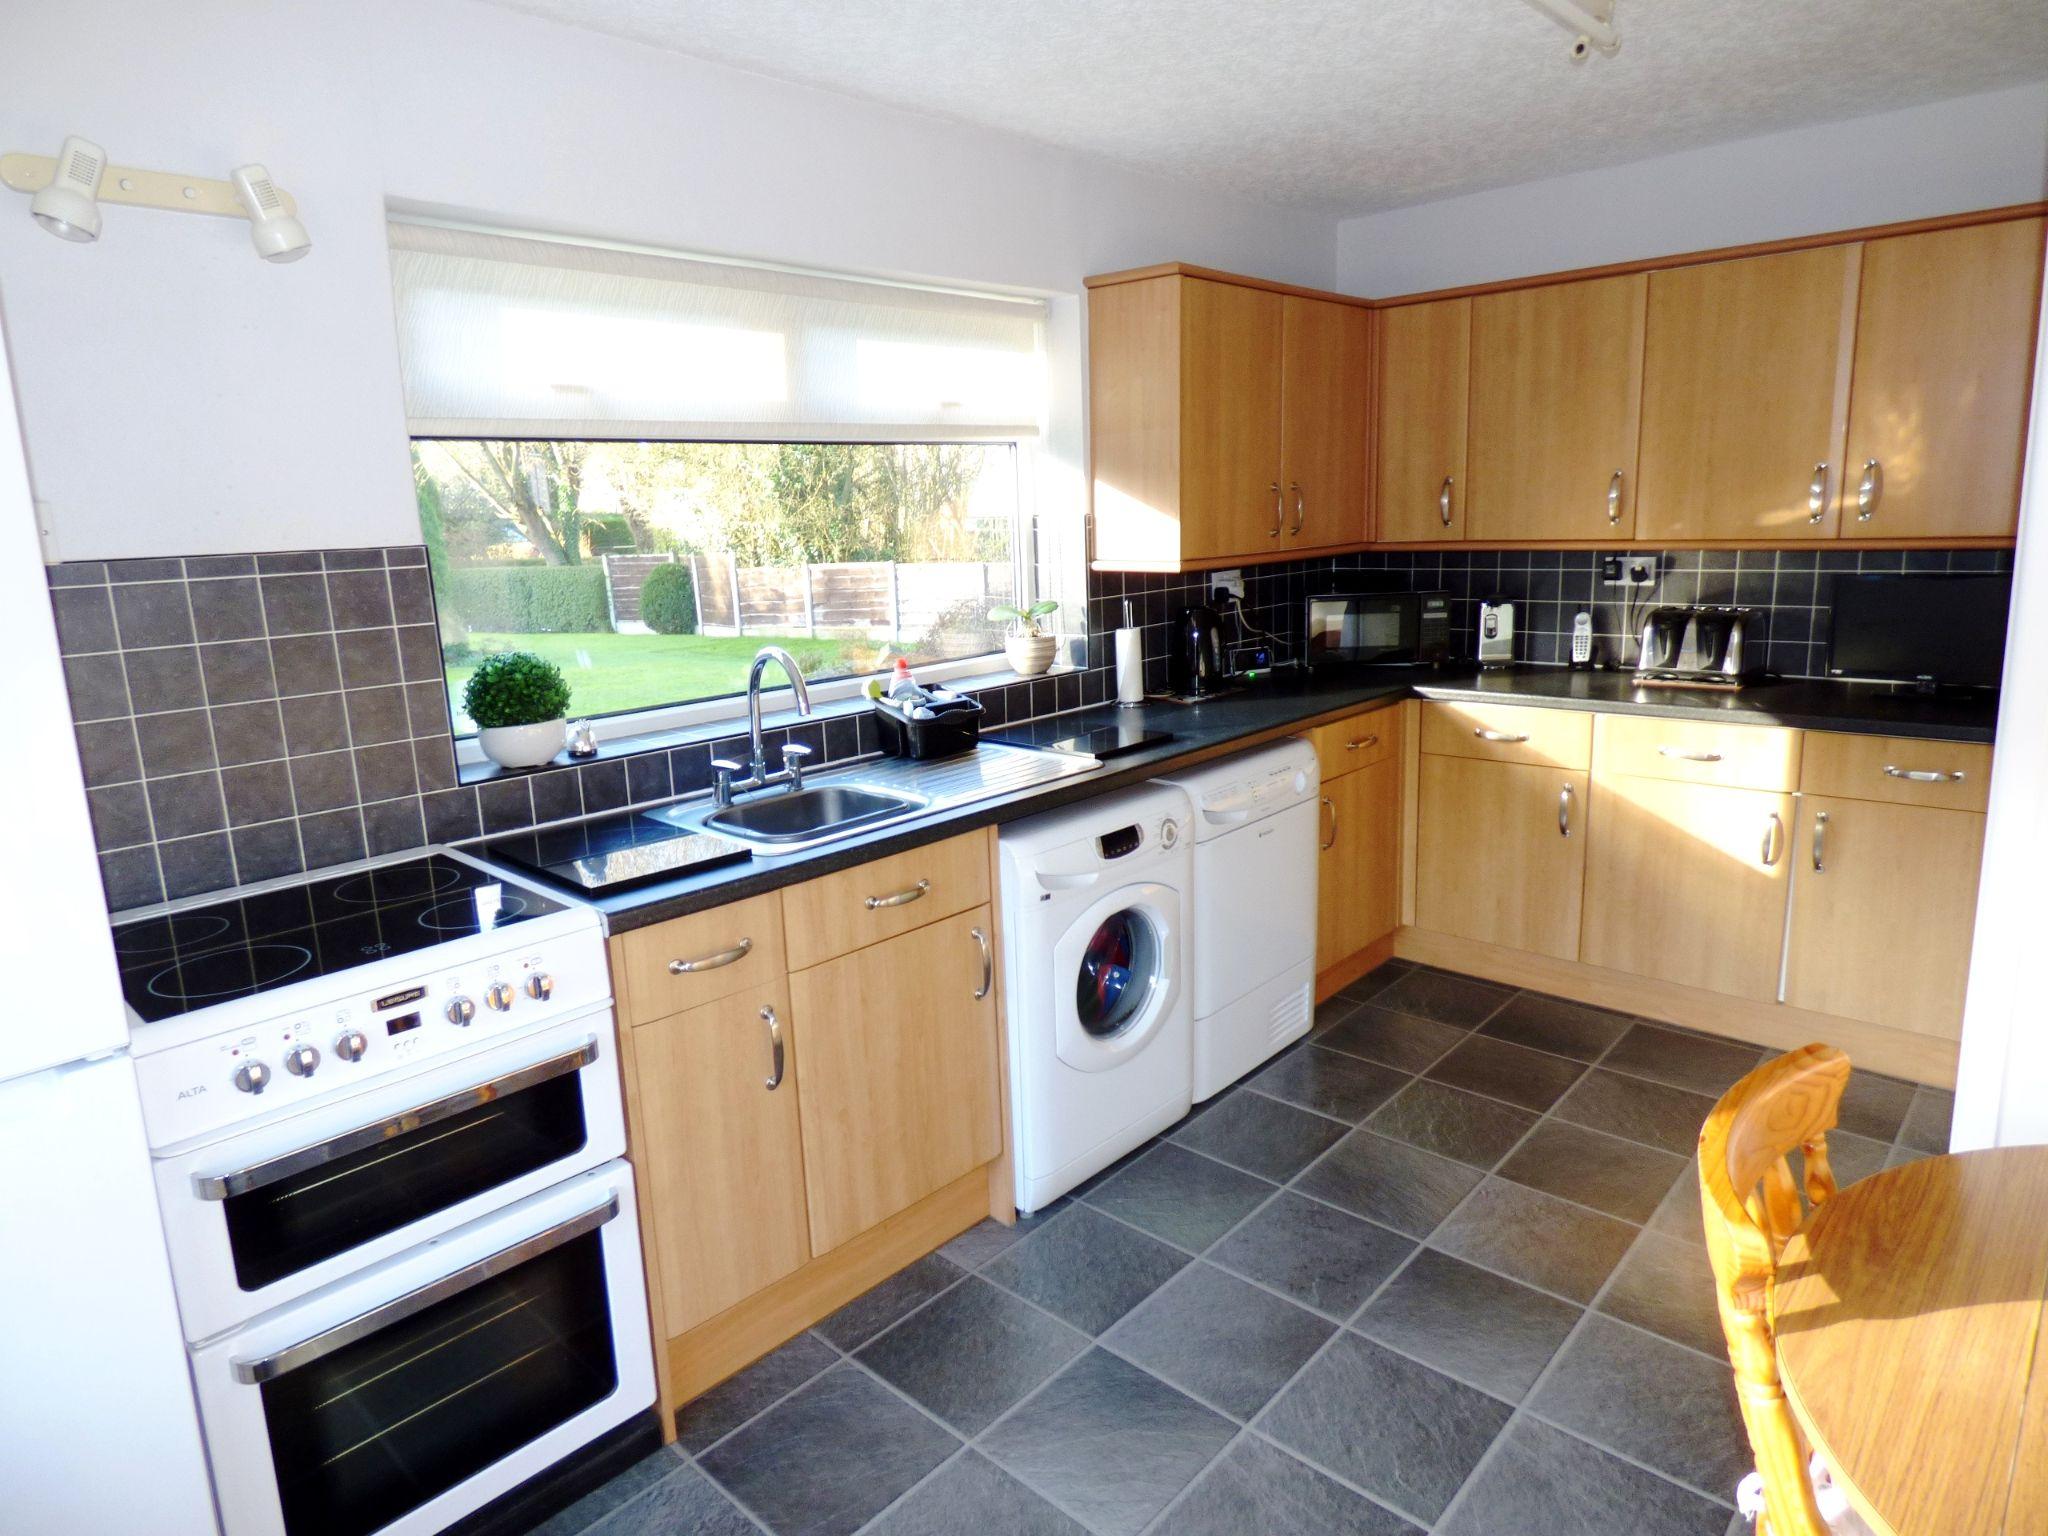 4 Bedroom Detached Bungalow For Sale - Kitchen